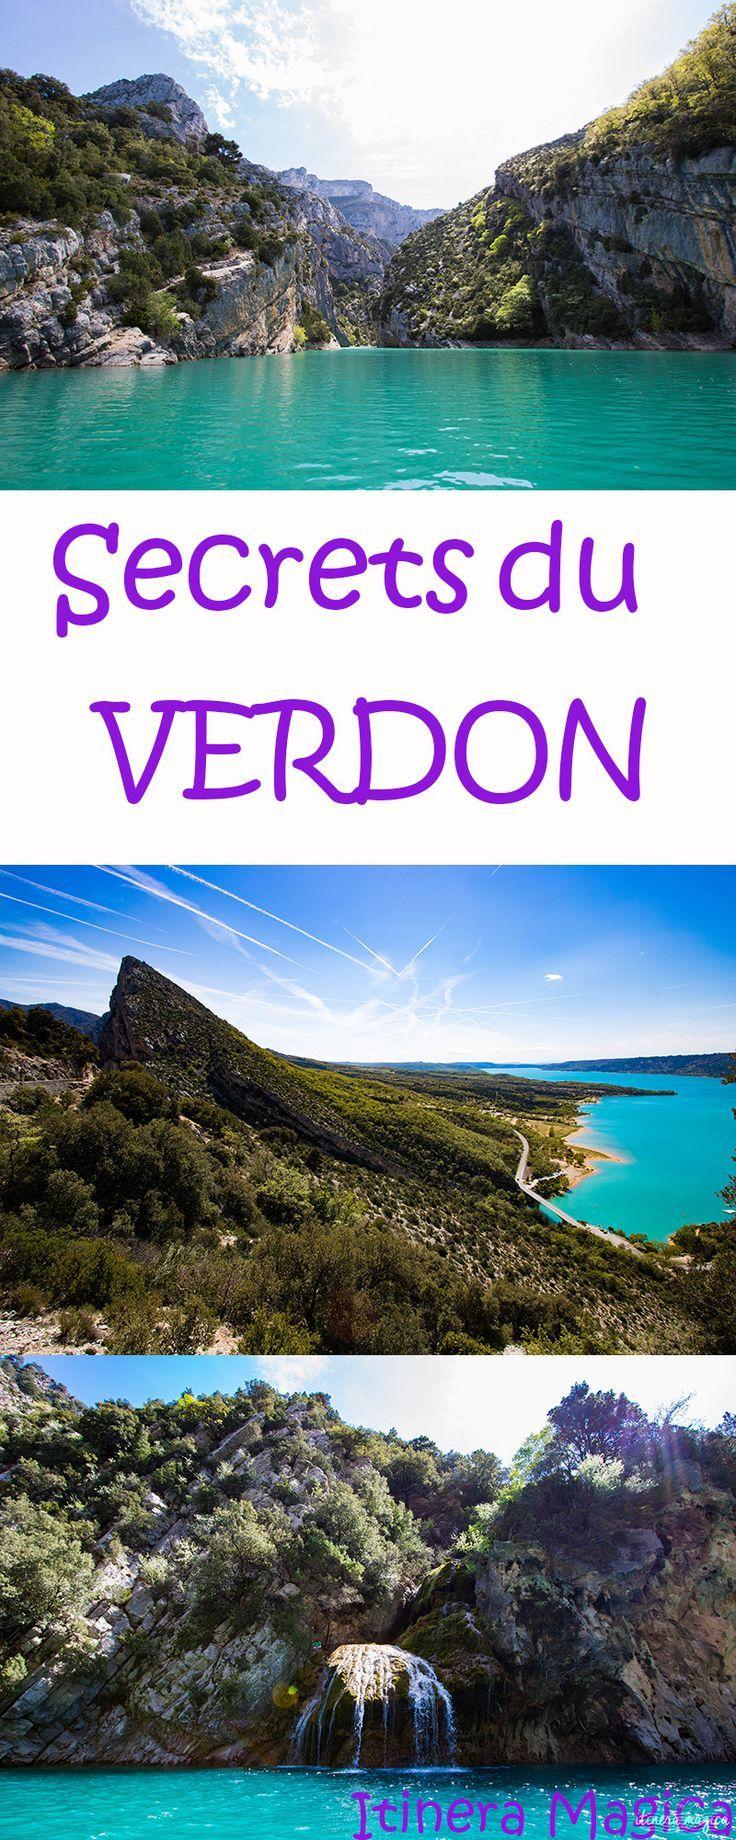 Le Verdon, joyau de Provence – Itinera-magica.com